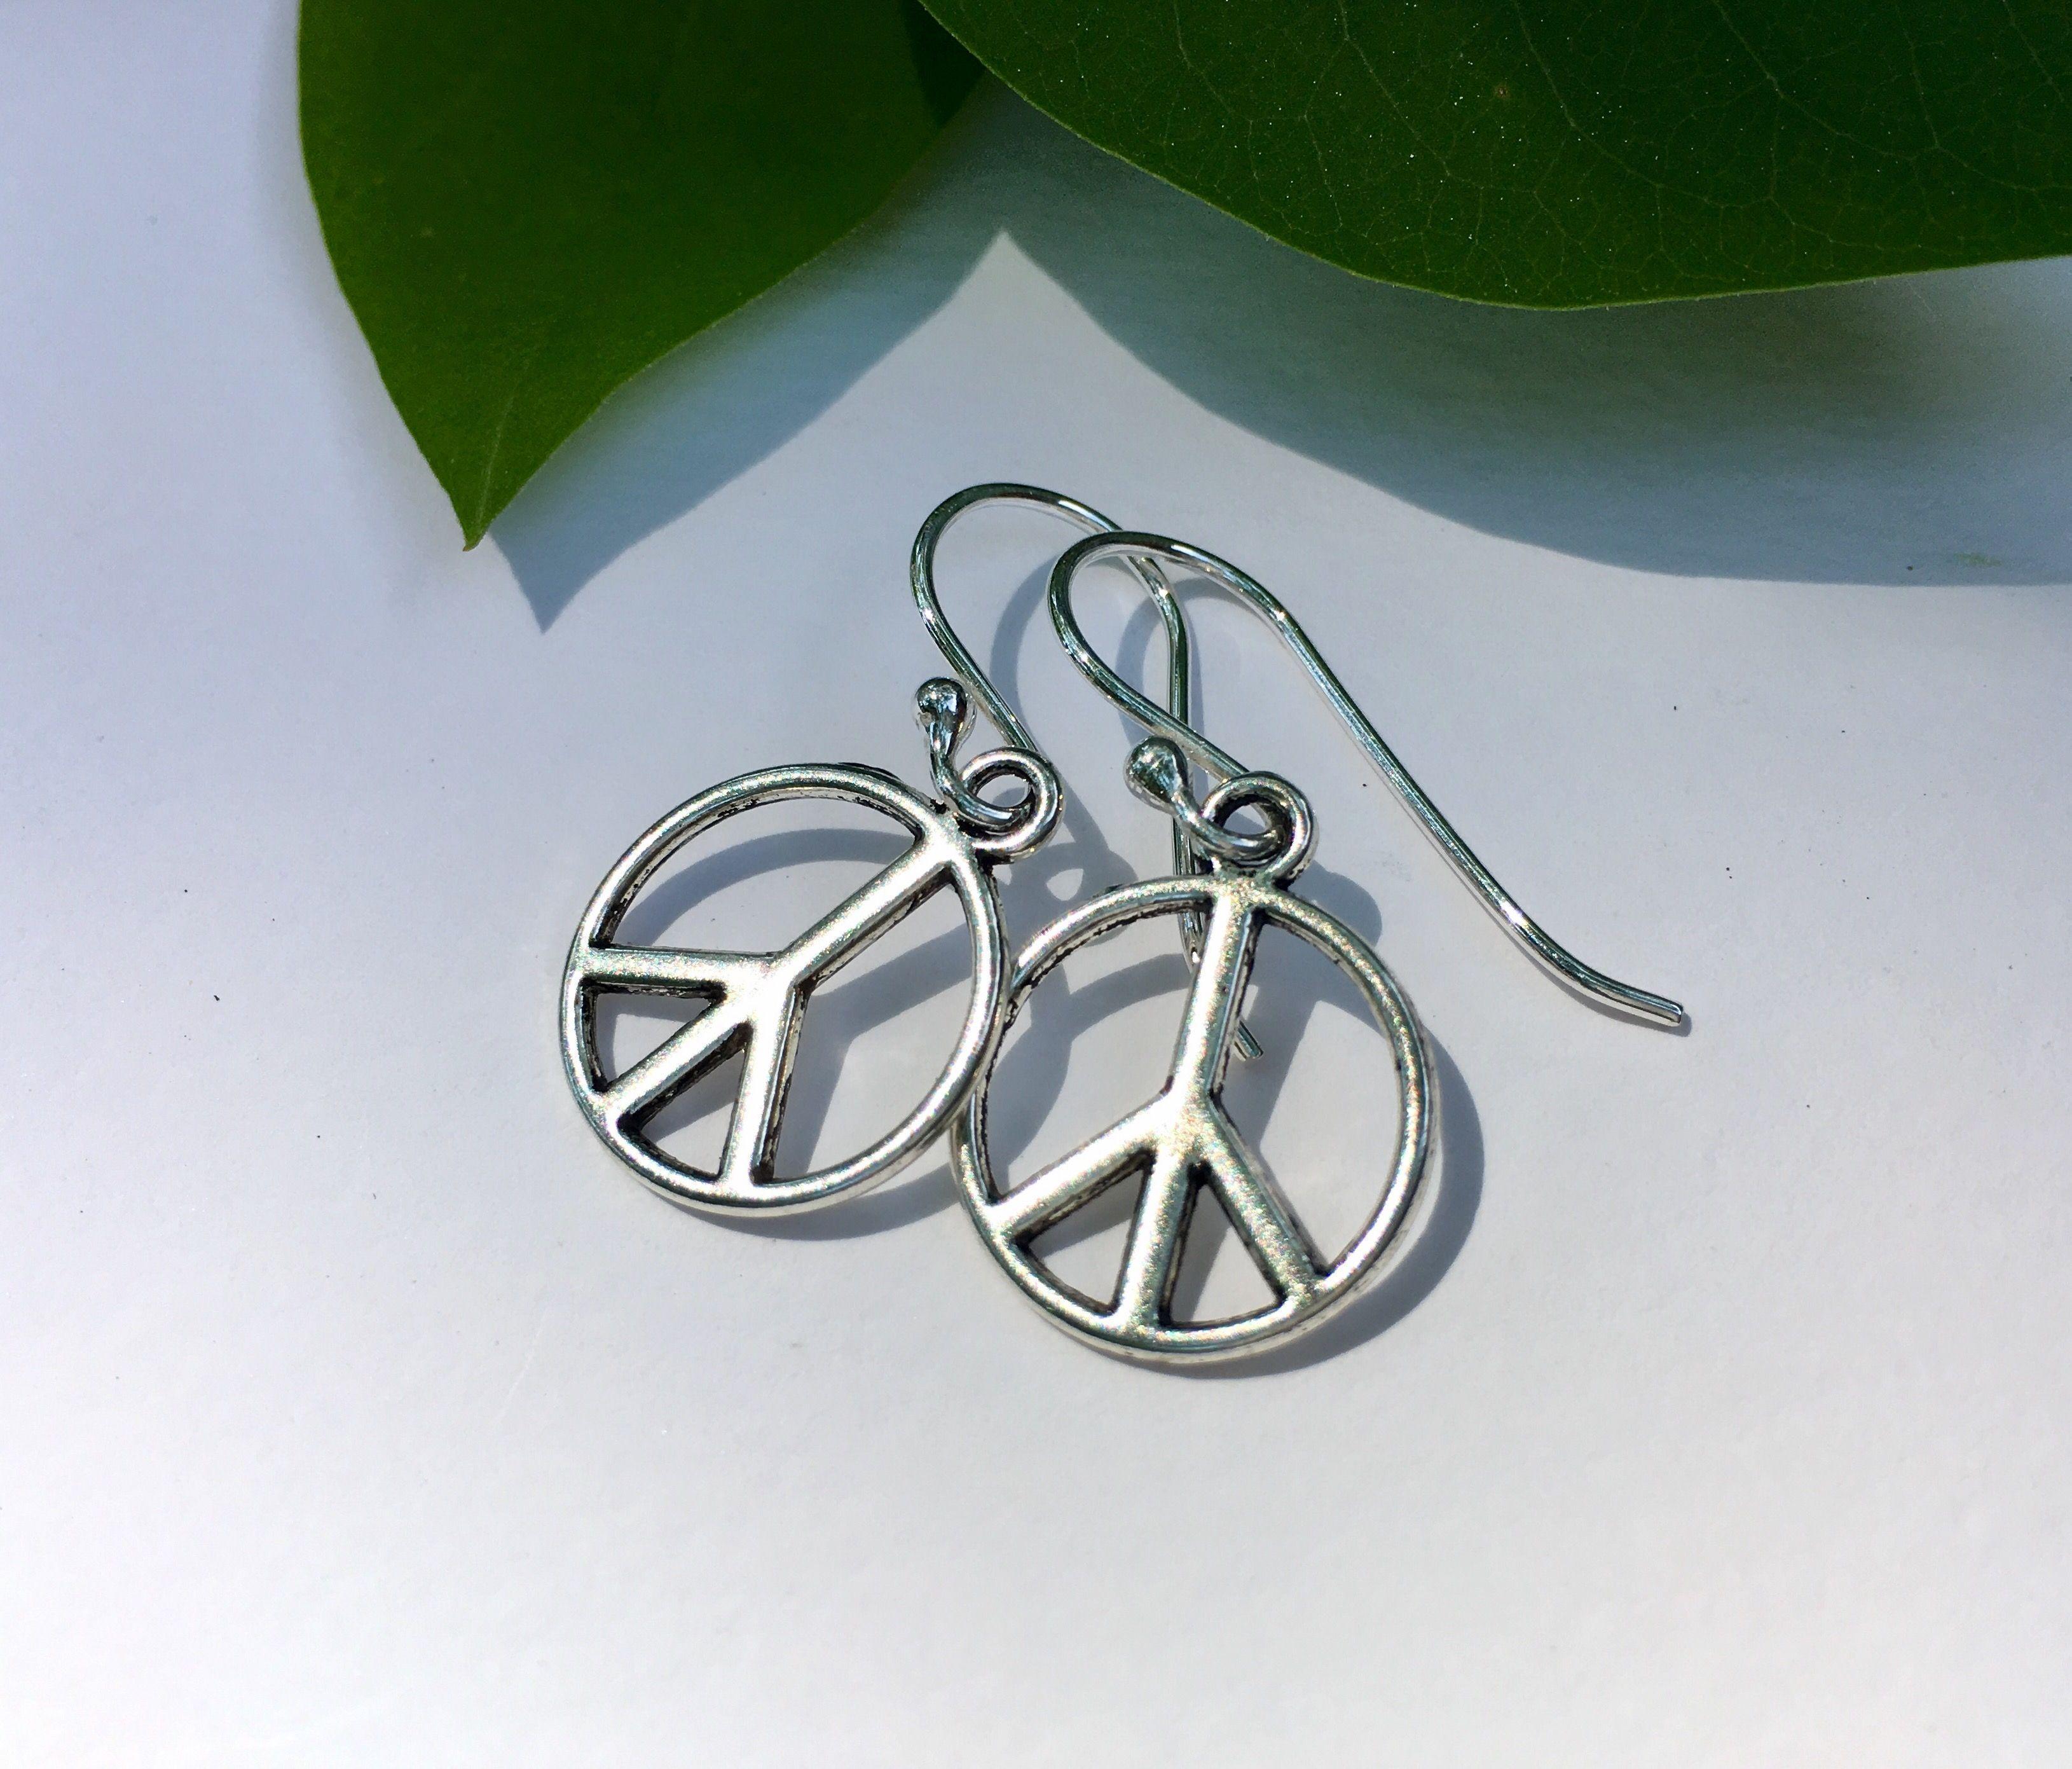 ☮️PEACE sign earrings by JoyfulByNature. Gift idea - share peace :) https://img1.etsystatic.com/123/2/8965783/il_fullxfull.1030755565_13d4.jpg #etsymntt #peace #usa #etsyfinds